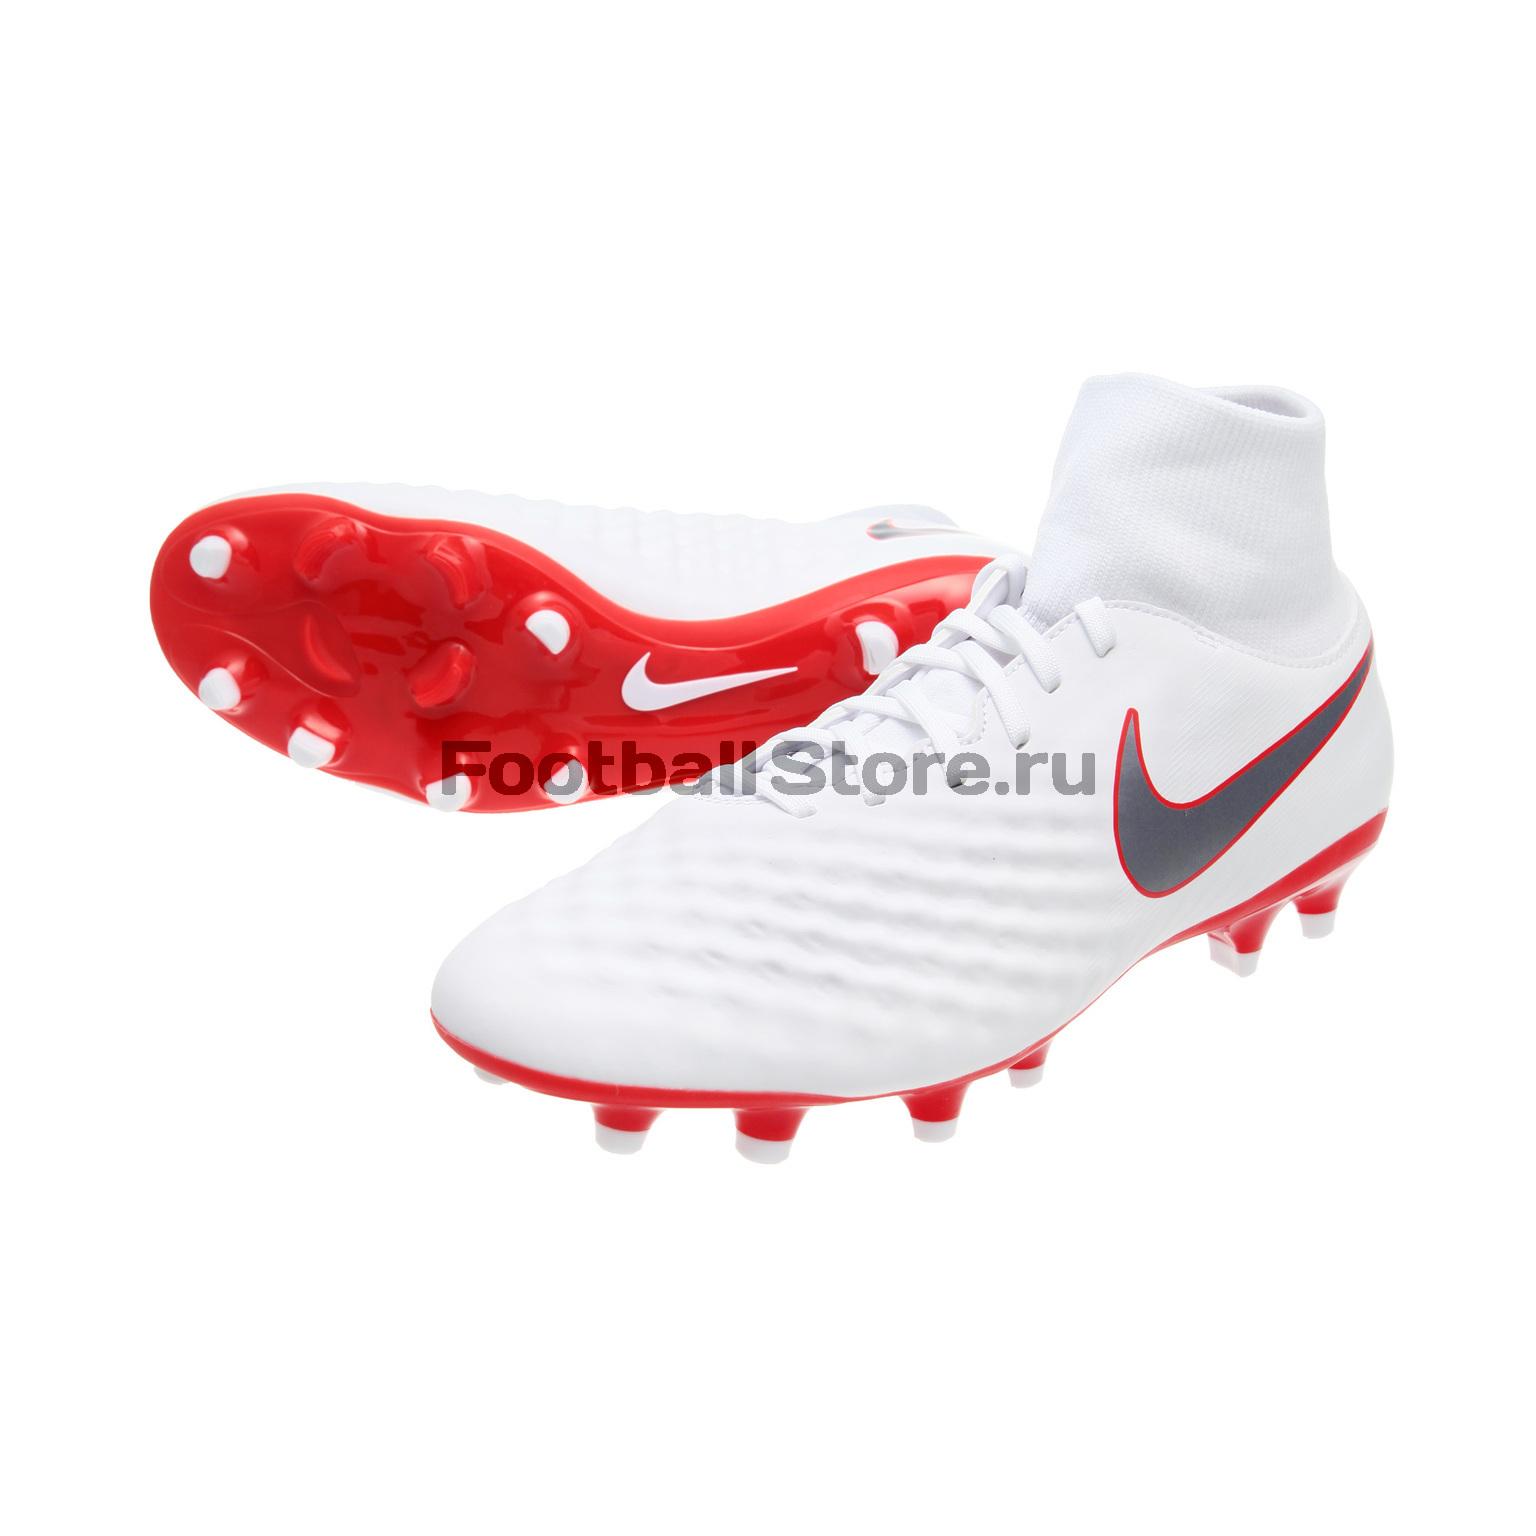 Бутсы Nike Obra 2 Academy DF FG AH7303-107 бутсы nike jr obra 2 club fg ah7314 107